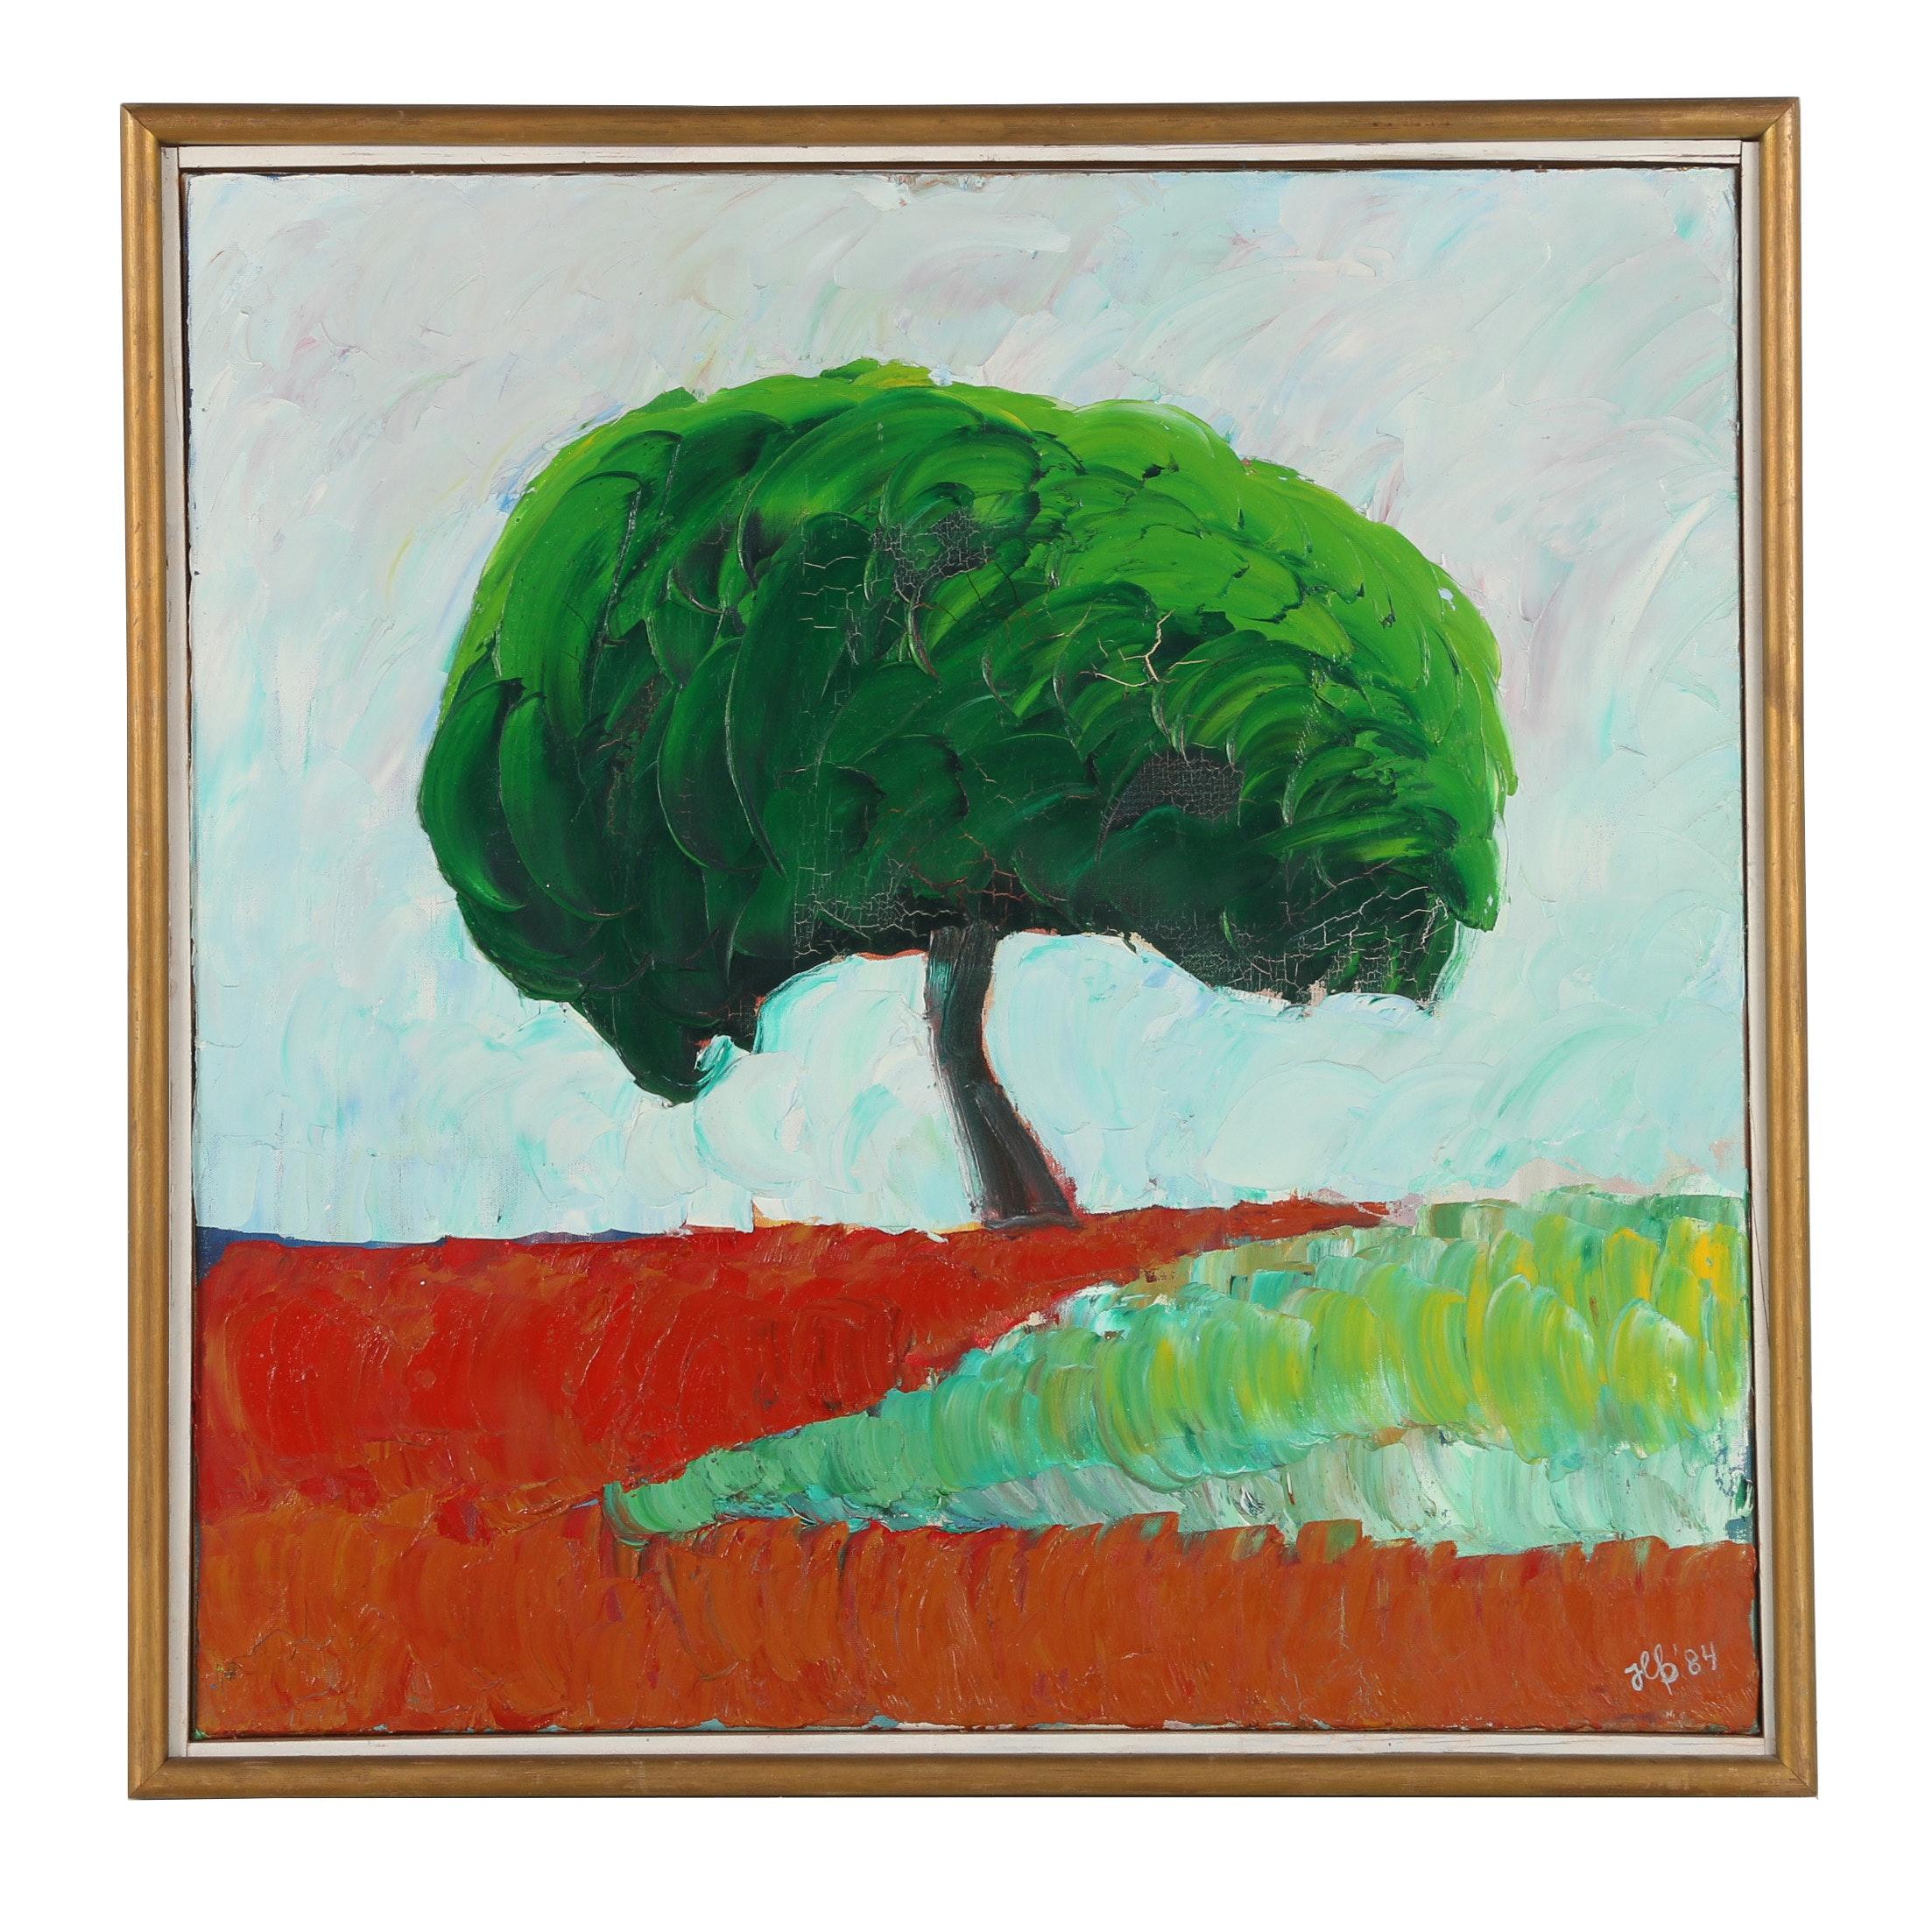 J. L. B. Oil Painting